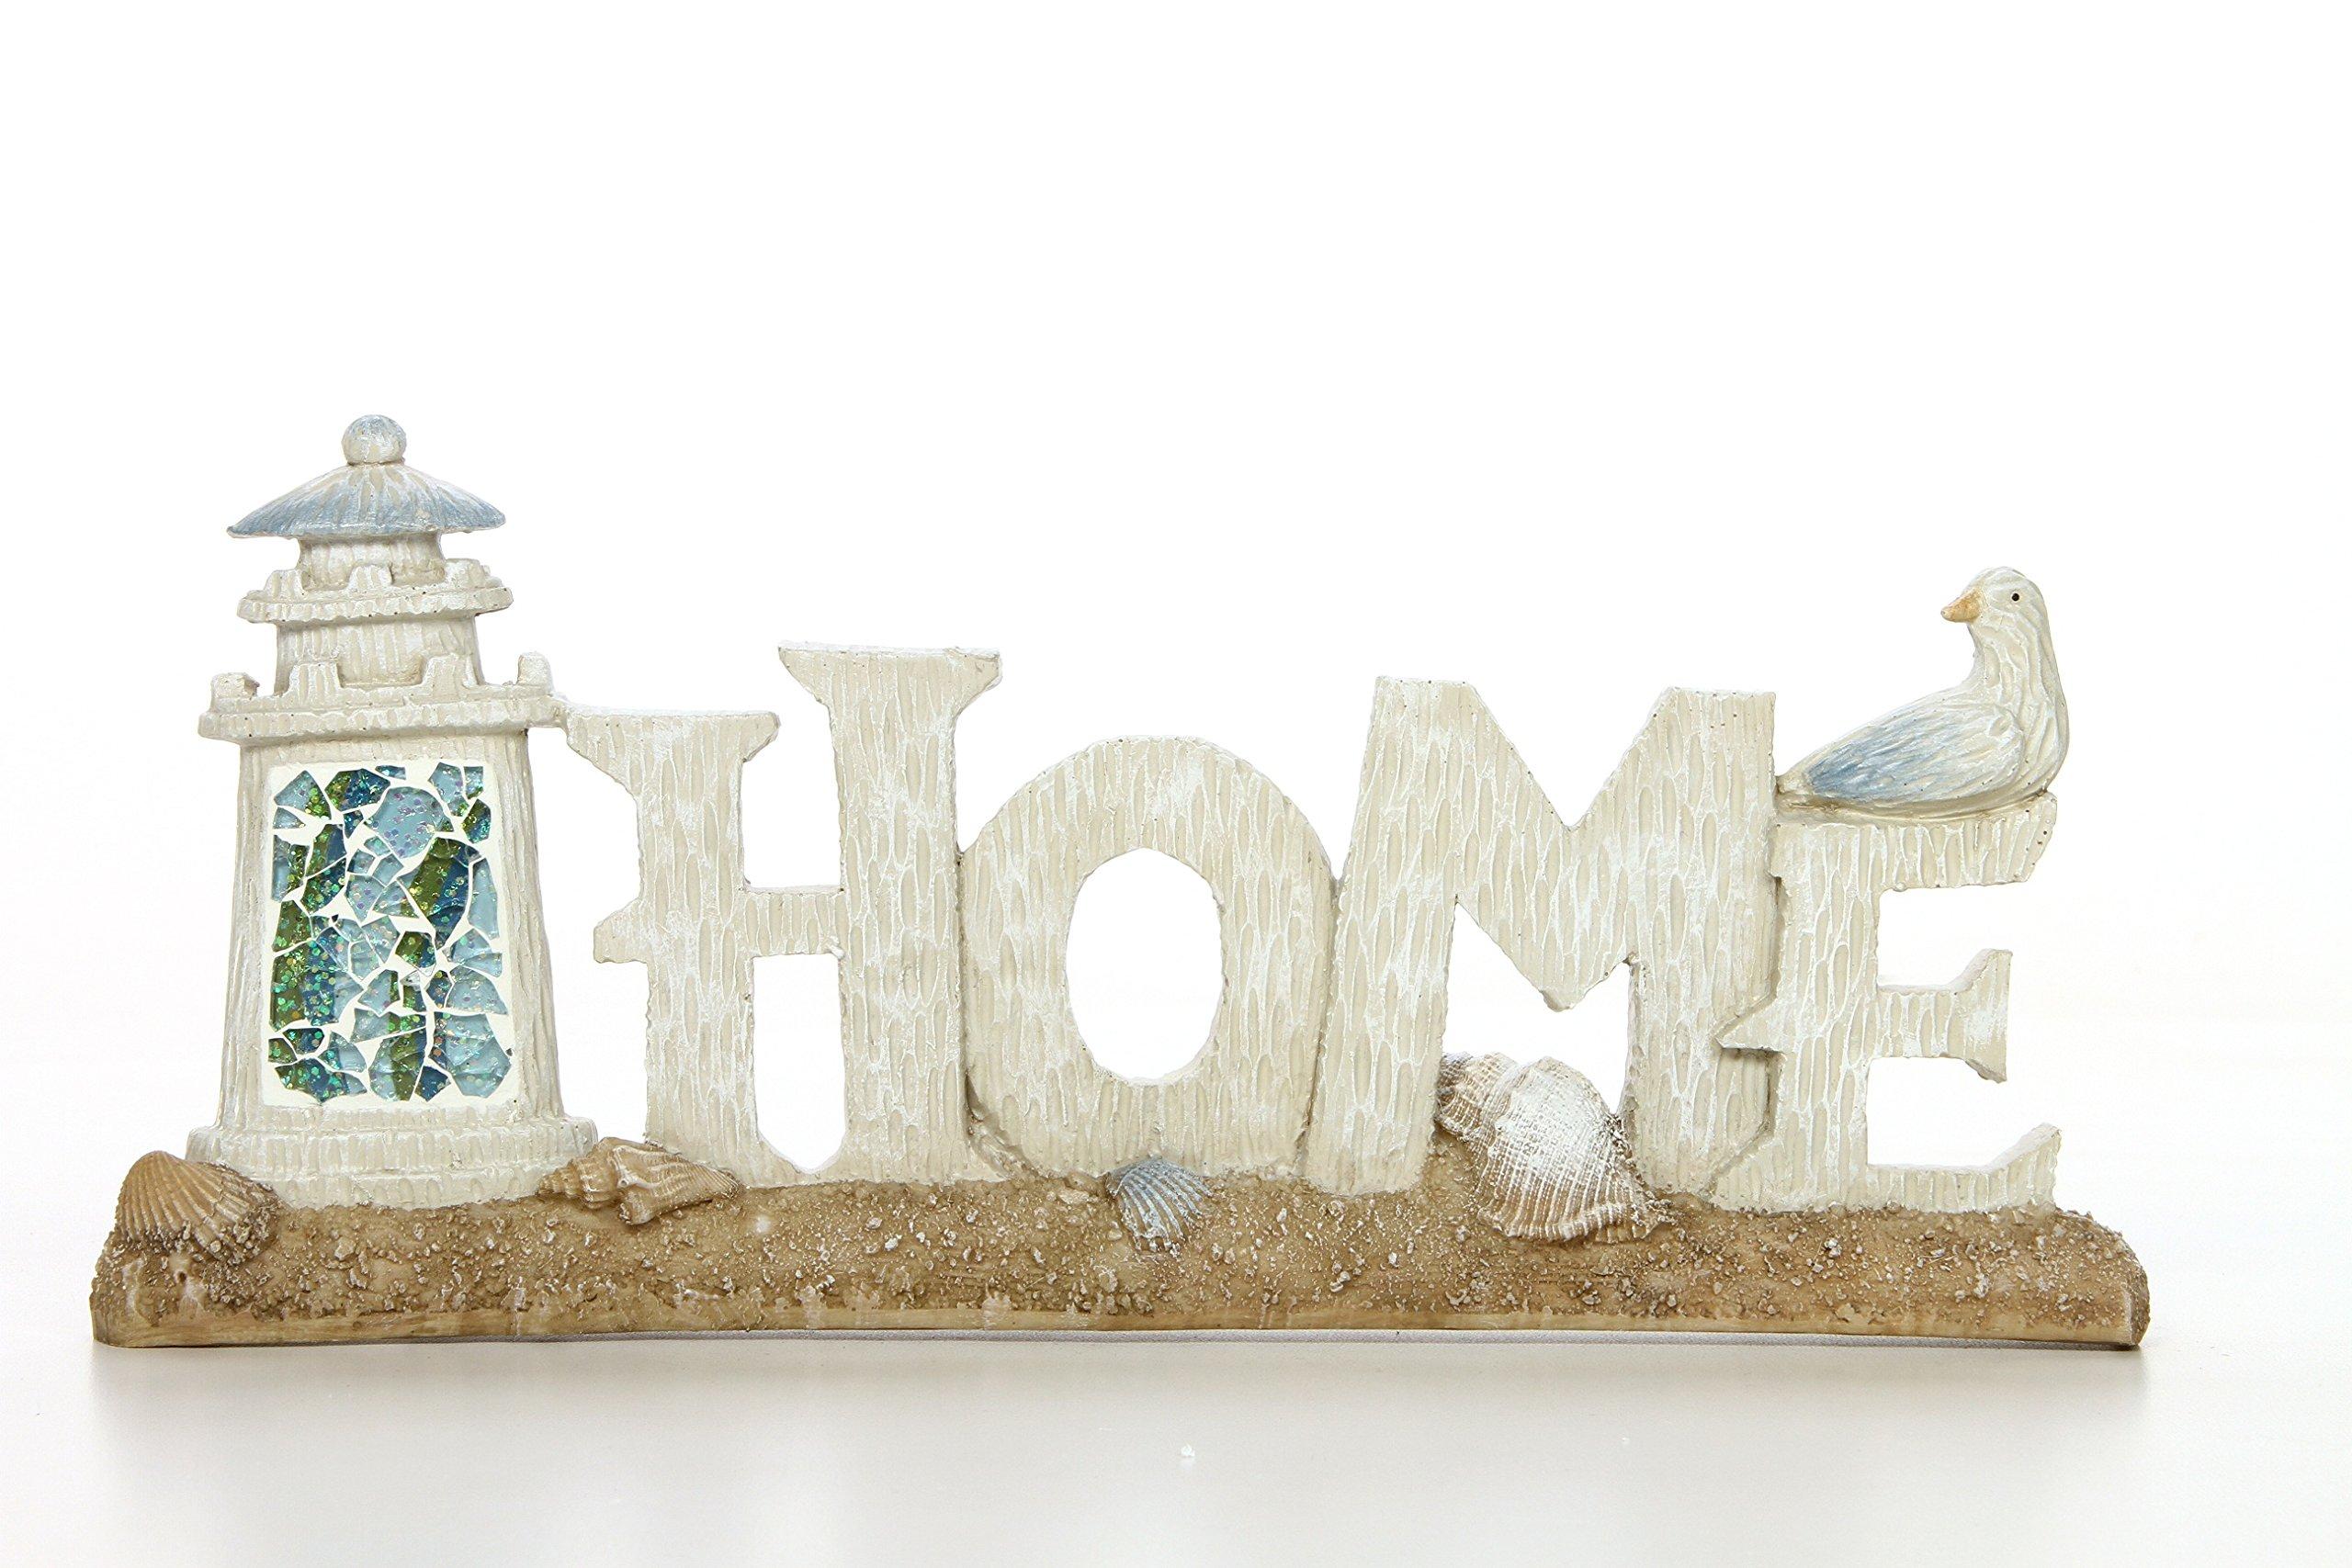 Hosley 12'' Long, Decorative Tabletop Home Word Art. Ideal Gift for Wedding, Home, Party Favor, Spa, Reiki, Meditation, Bathroom Settings O9